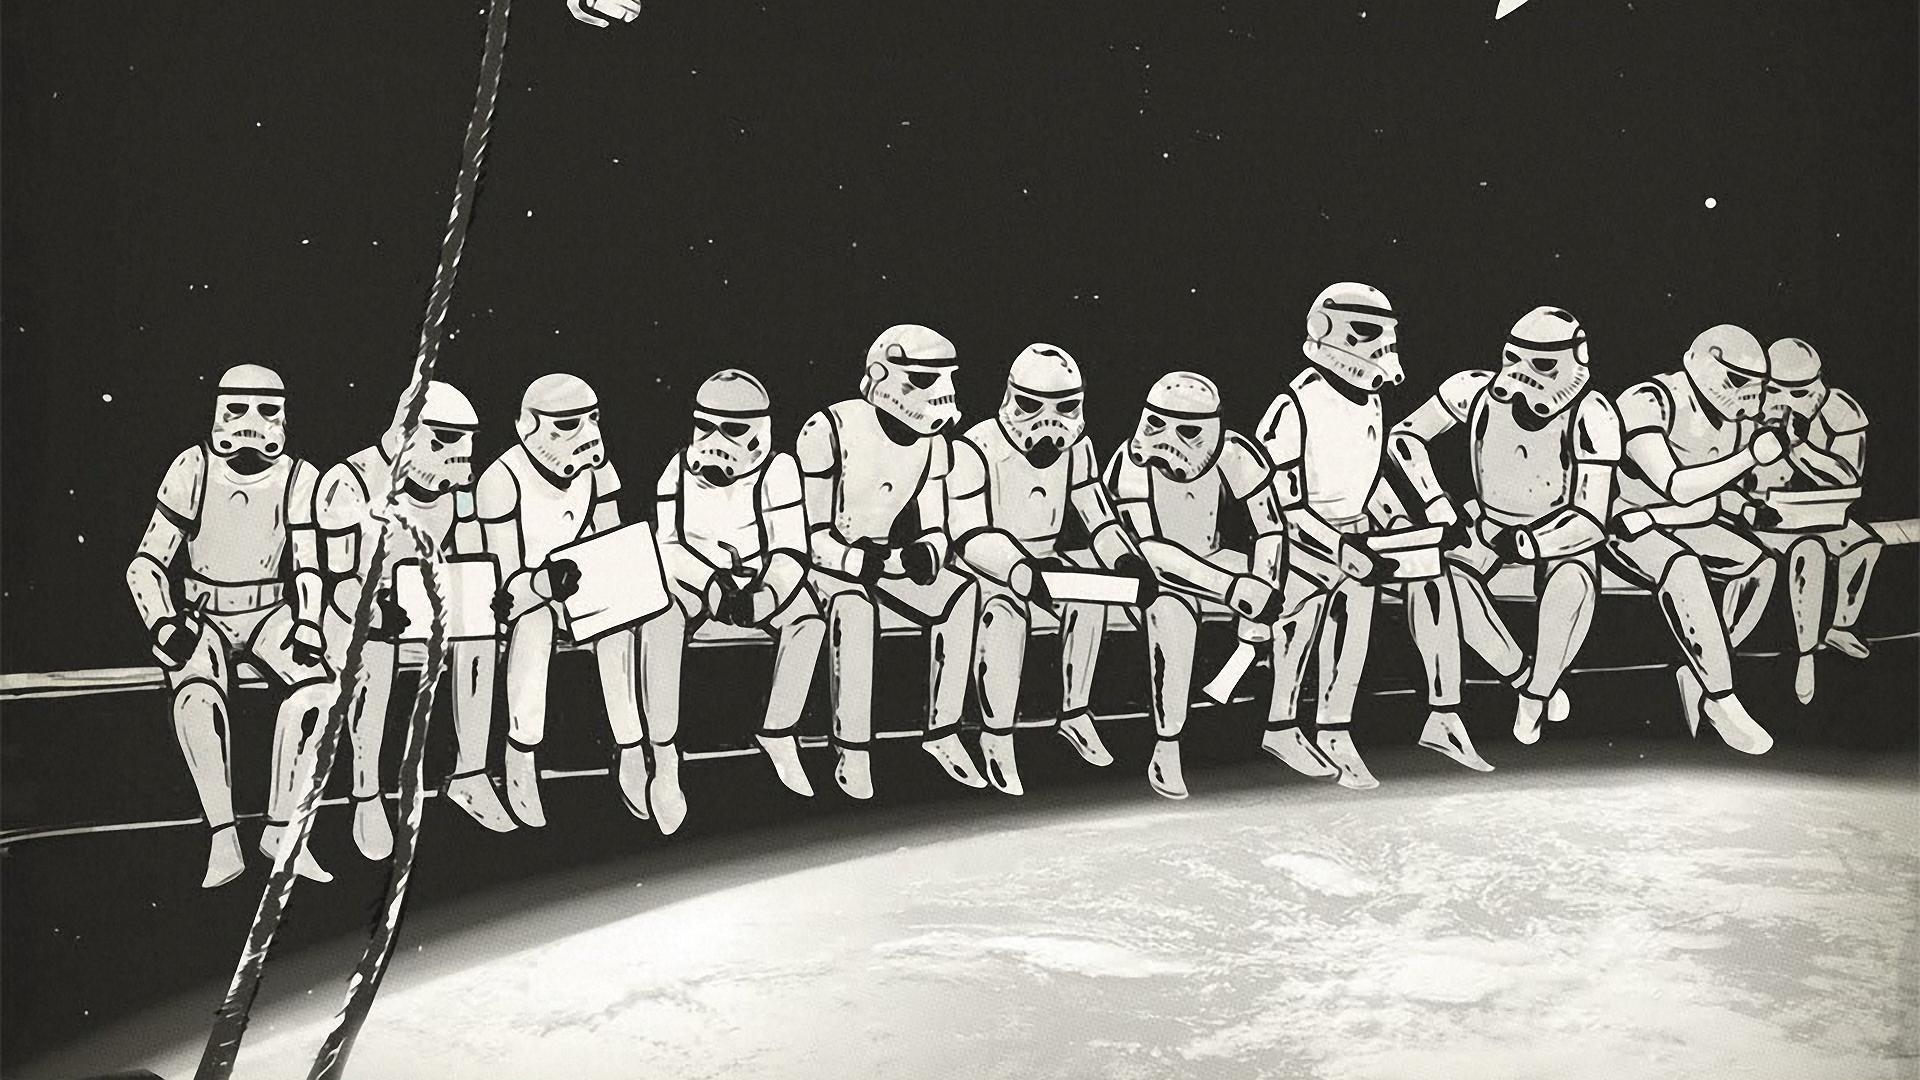 Star Wars Wallpaper Vintage